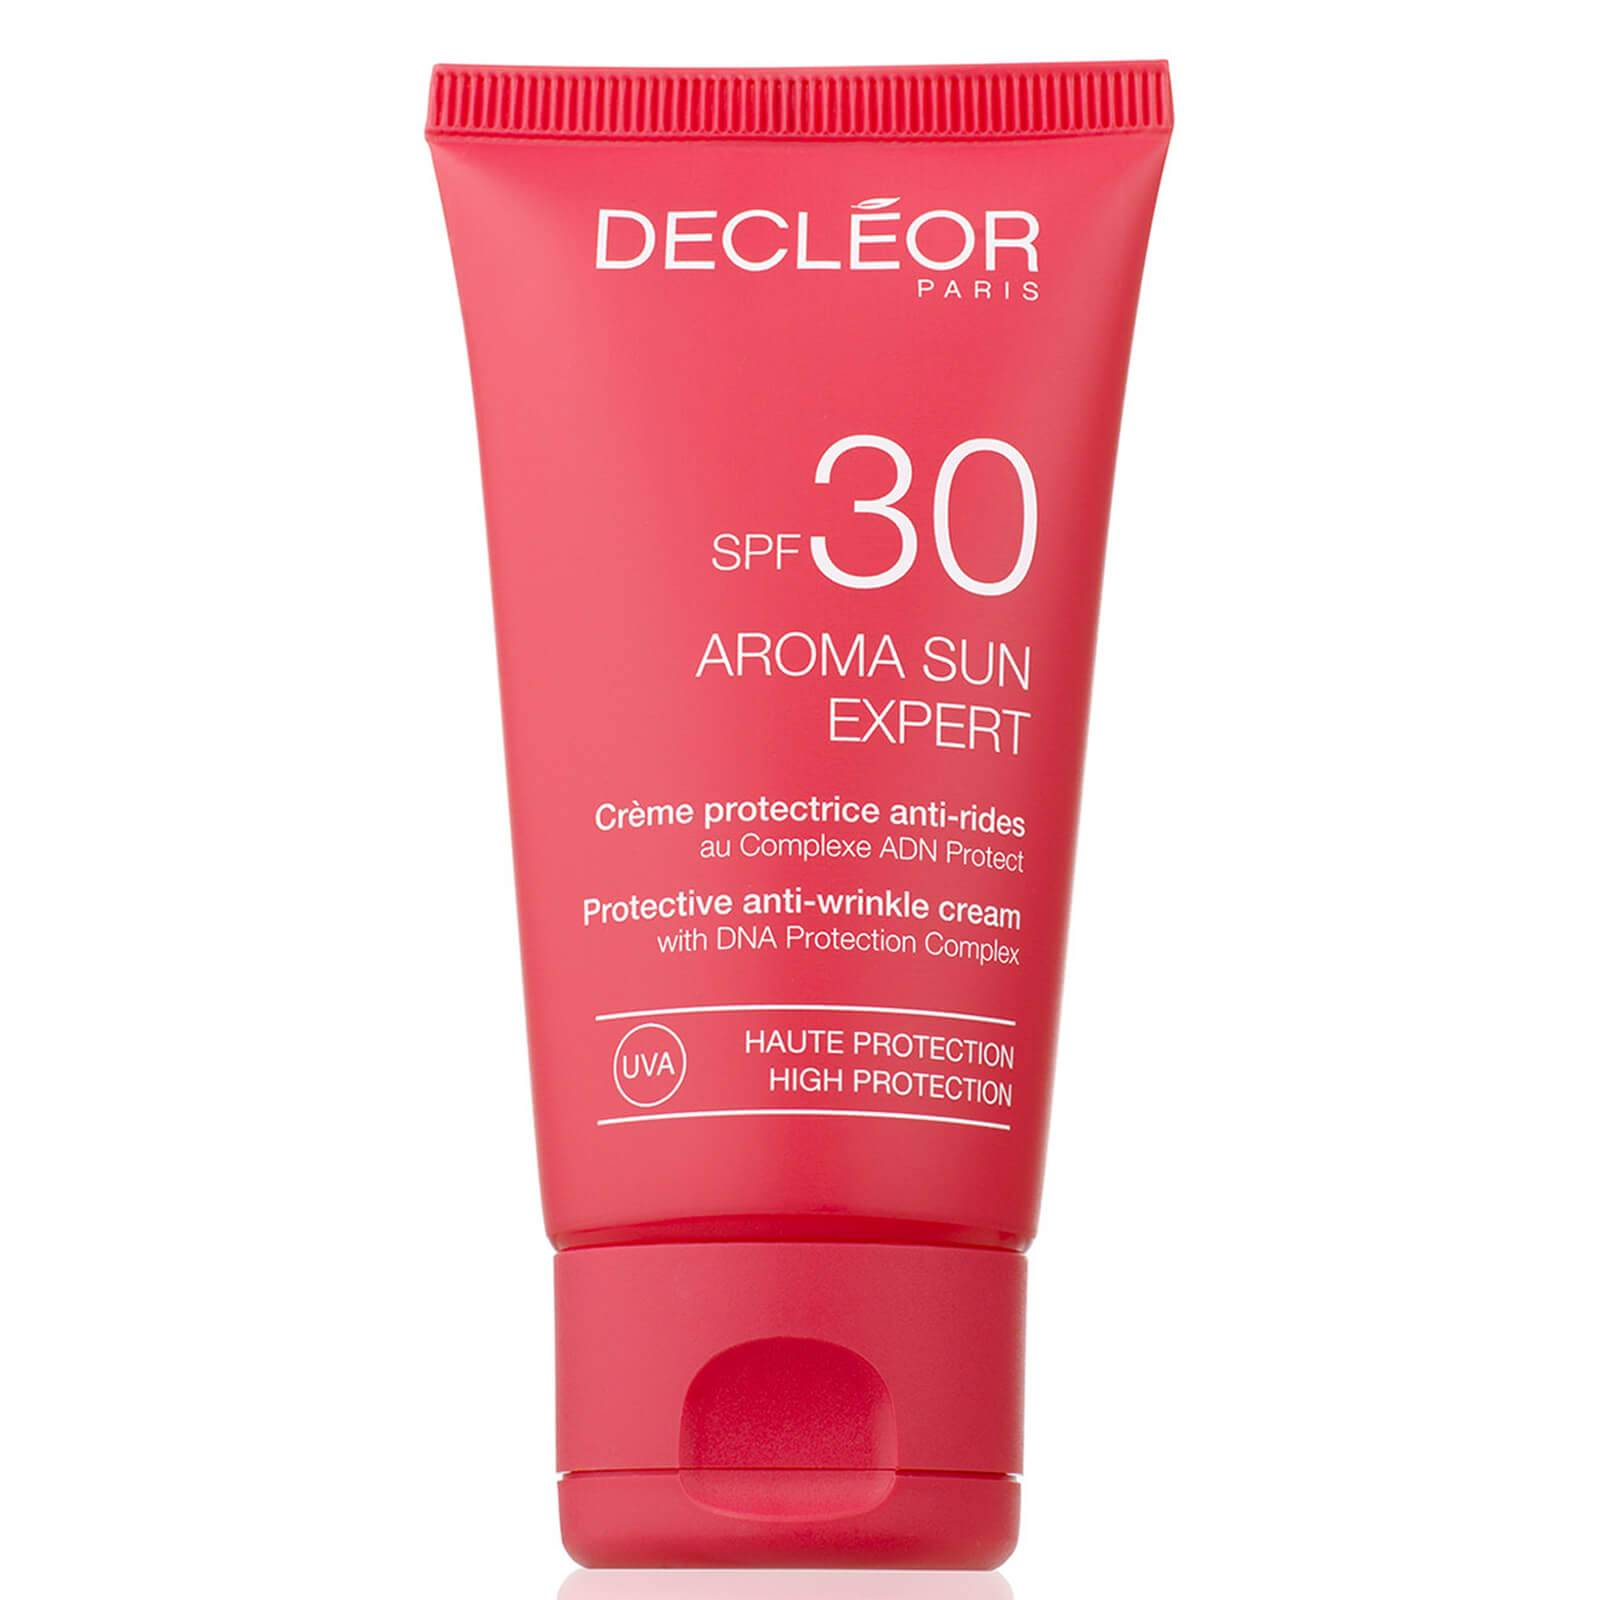 Decleor DECLÉOR Protective Anti Wrinkle Cream SPF 30 Face (50 ml)